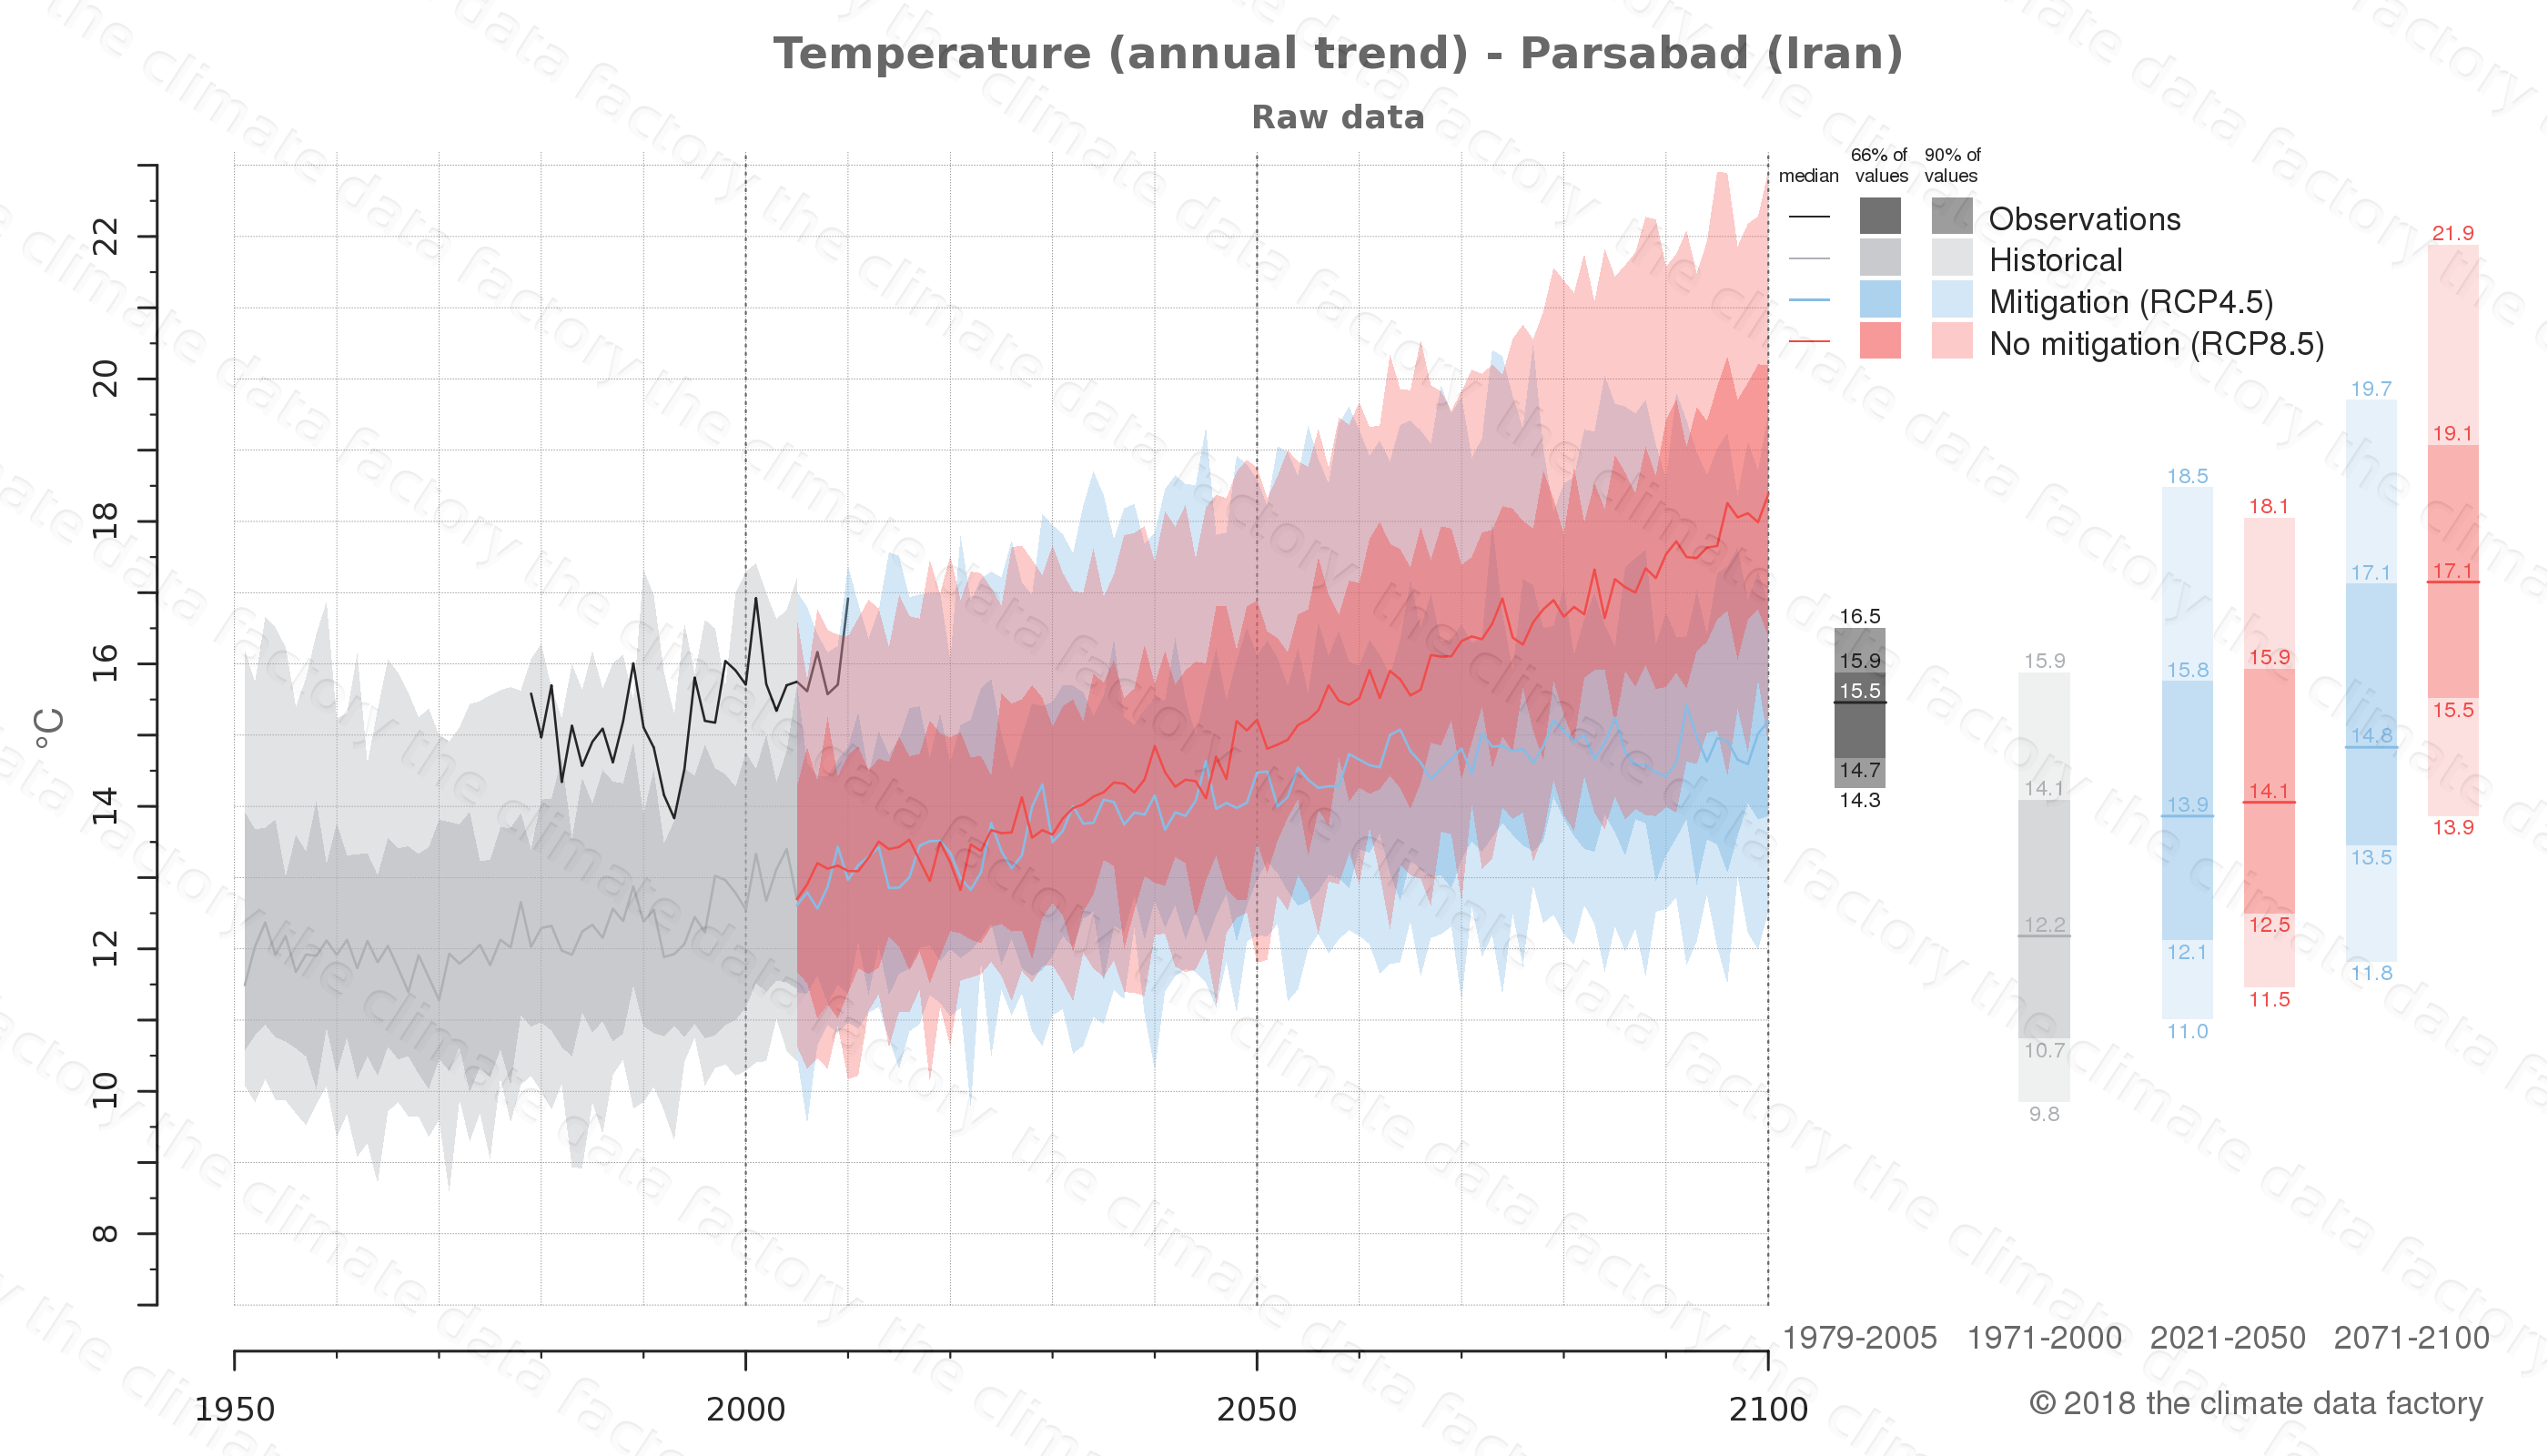 climate change data policy adaptation climate graph city data temperature parsabad iran